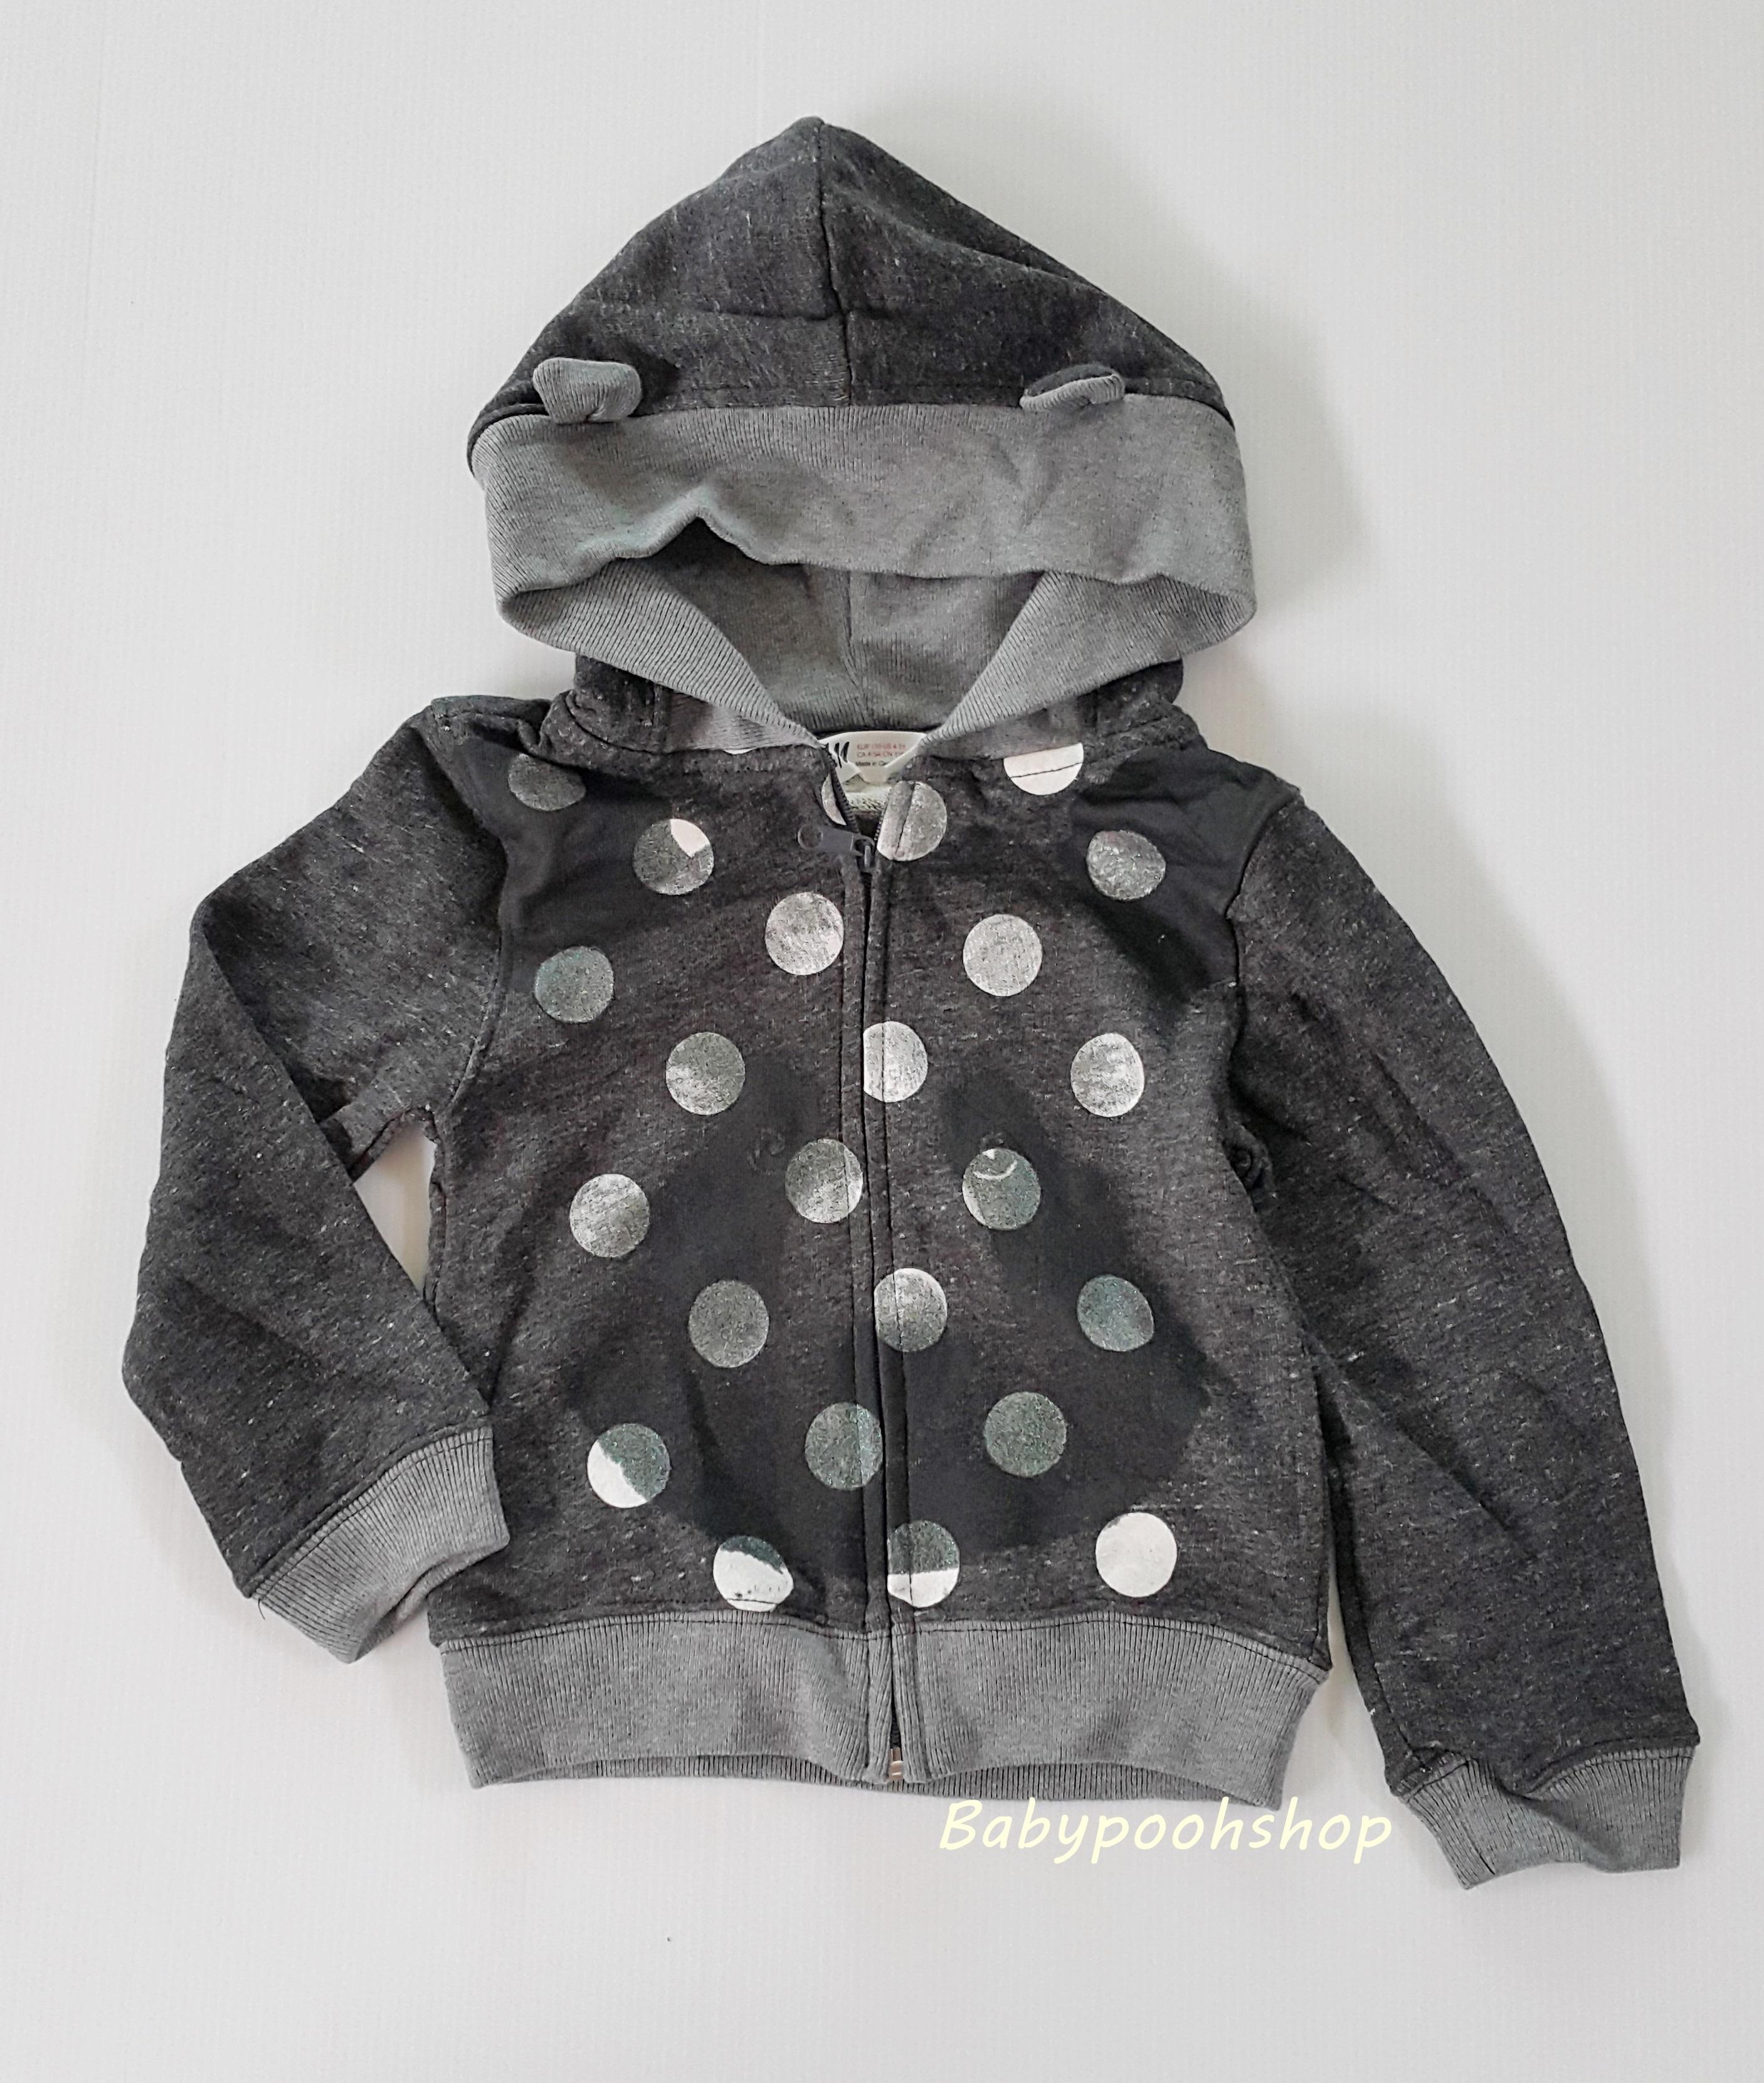 H&M : เสื้อแจ็คเก็ทกันหนาว มีฮูด ลายหมี สีเทาดำ ผ้าไม่หนามาก size 1-2y / 2-3y / 4-5y